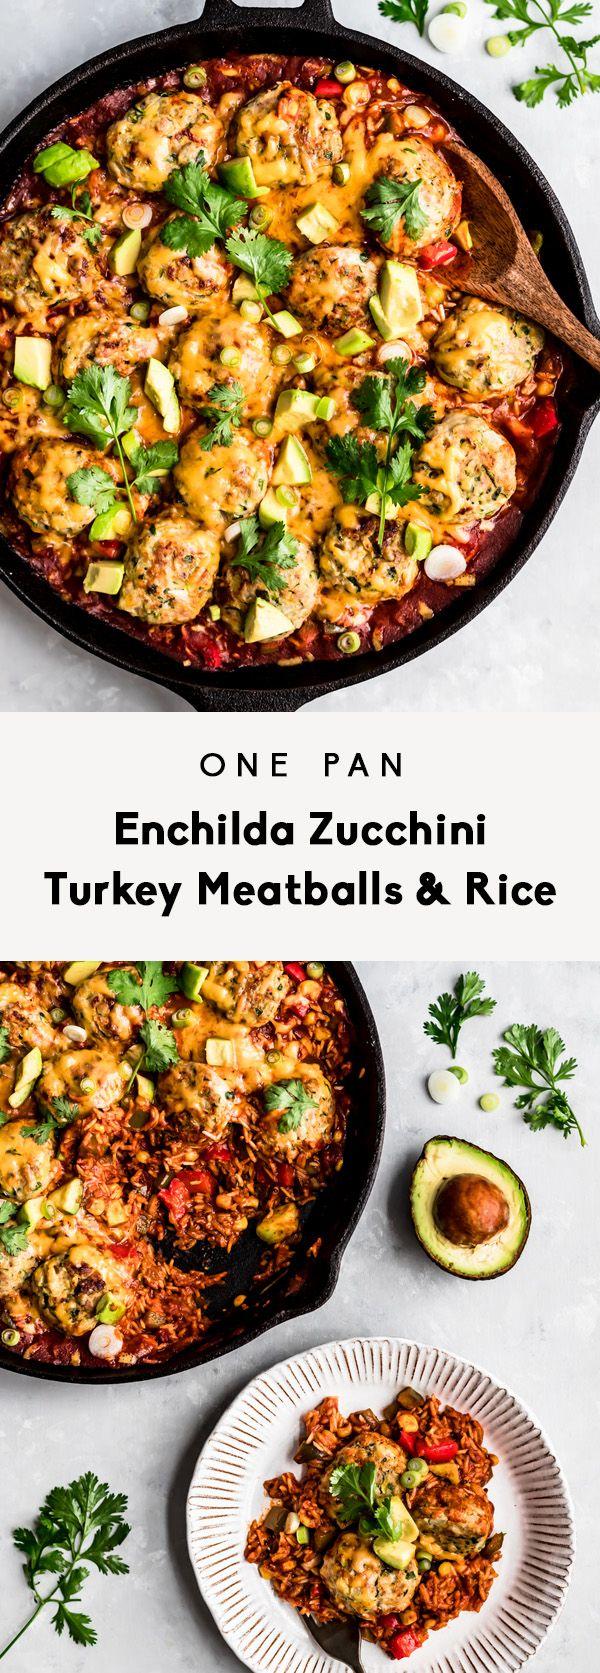 One Pan Enchilada Zucchini Turkey Meatballs & Rice | Ambitious Kitchen